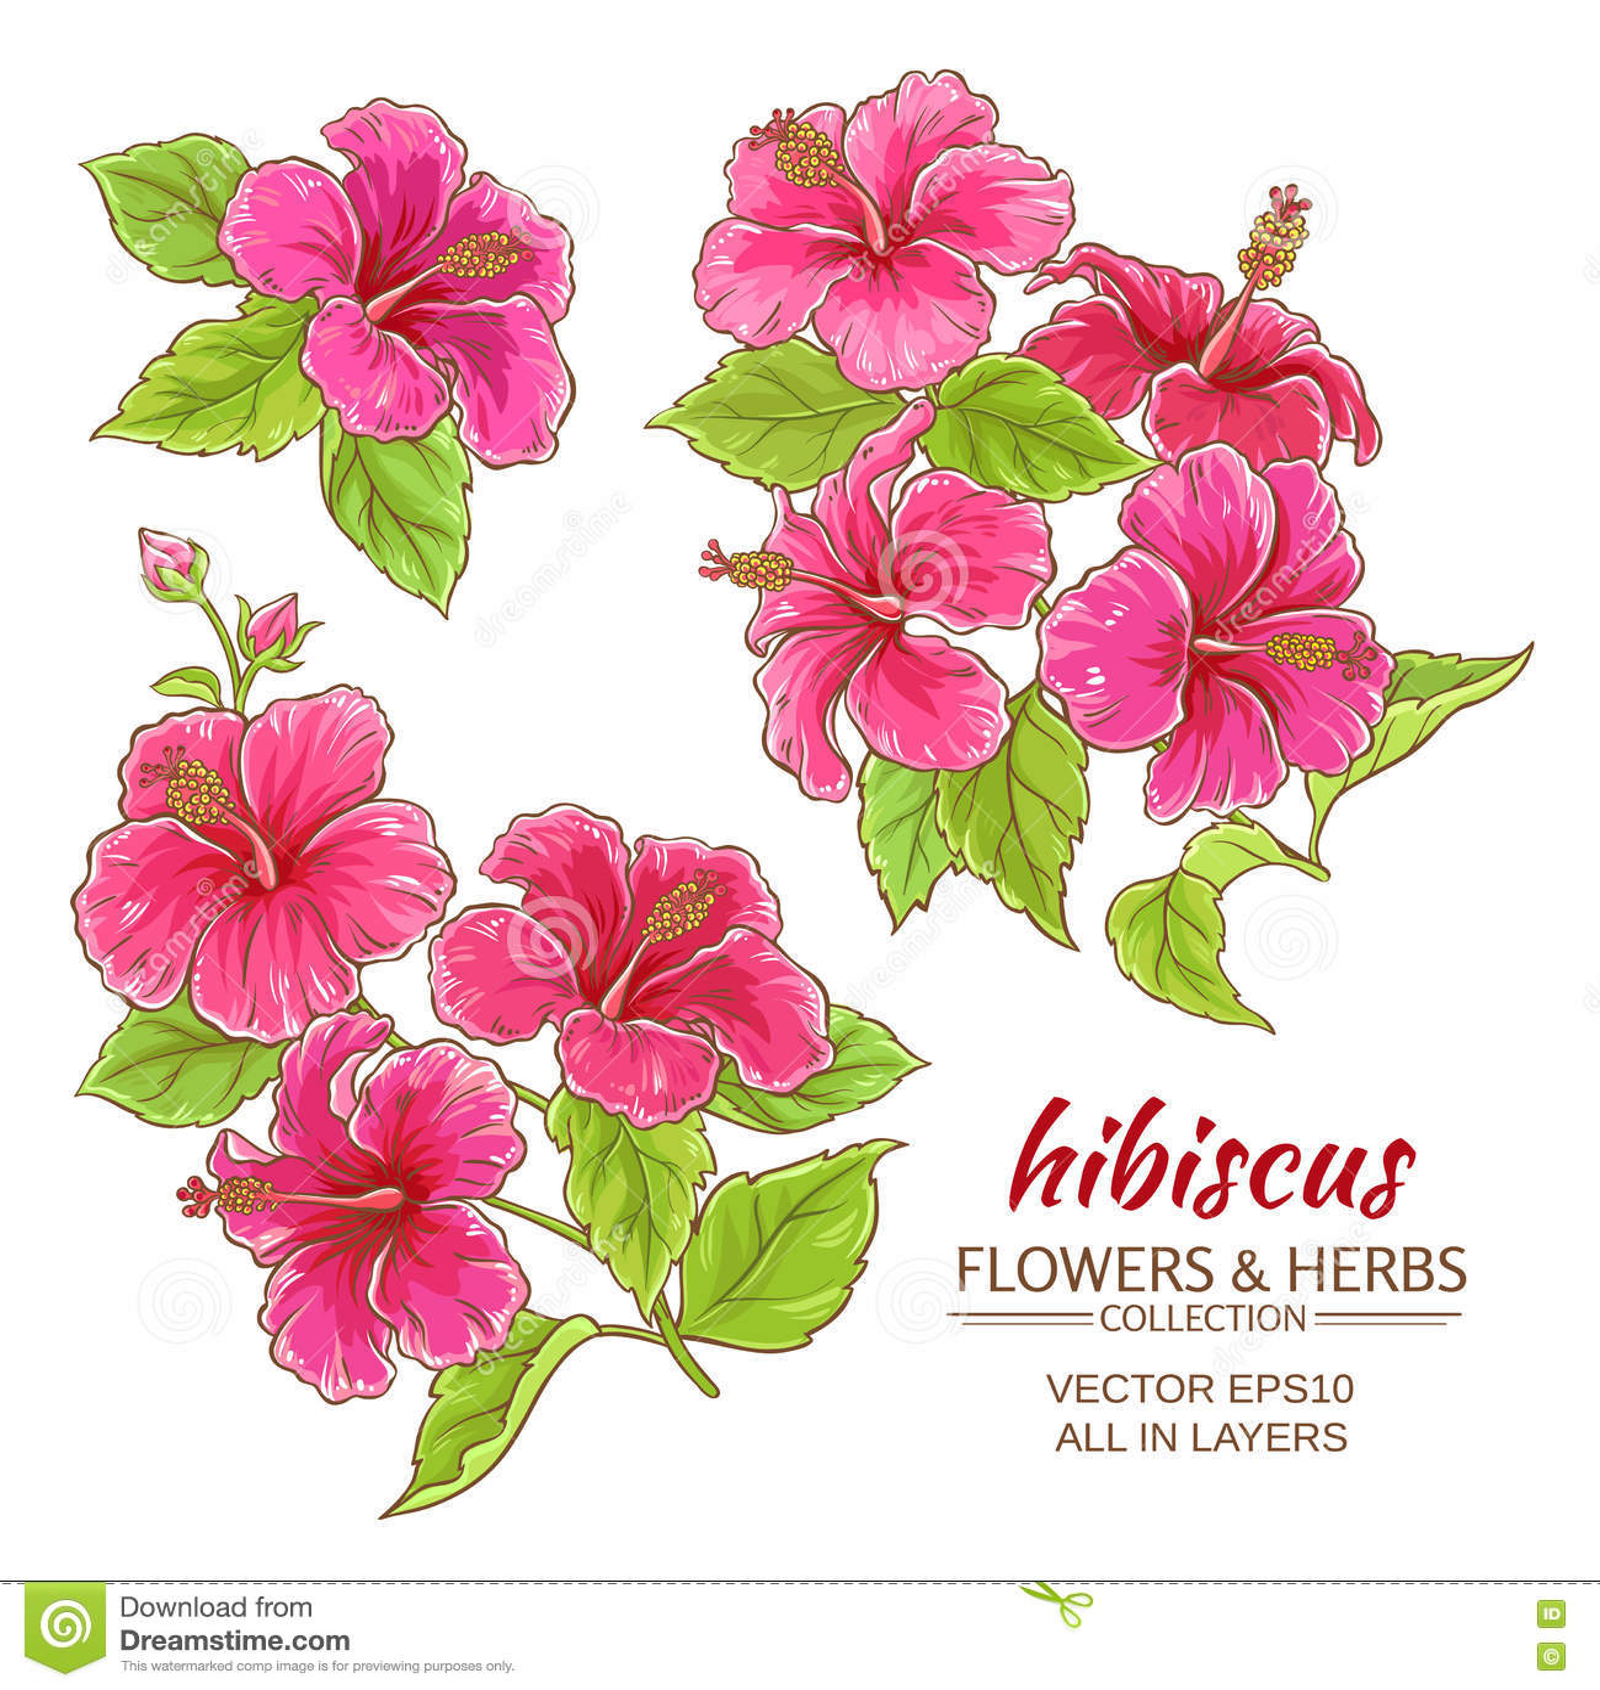 Hibiscus Flowers Vector Set Stock Vector Illustration Of Cartoon